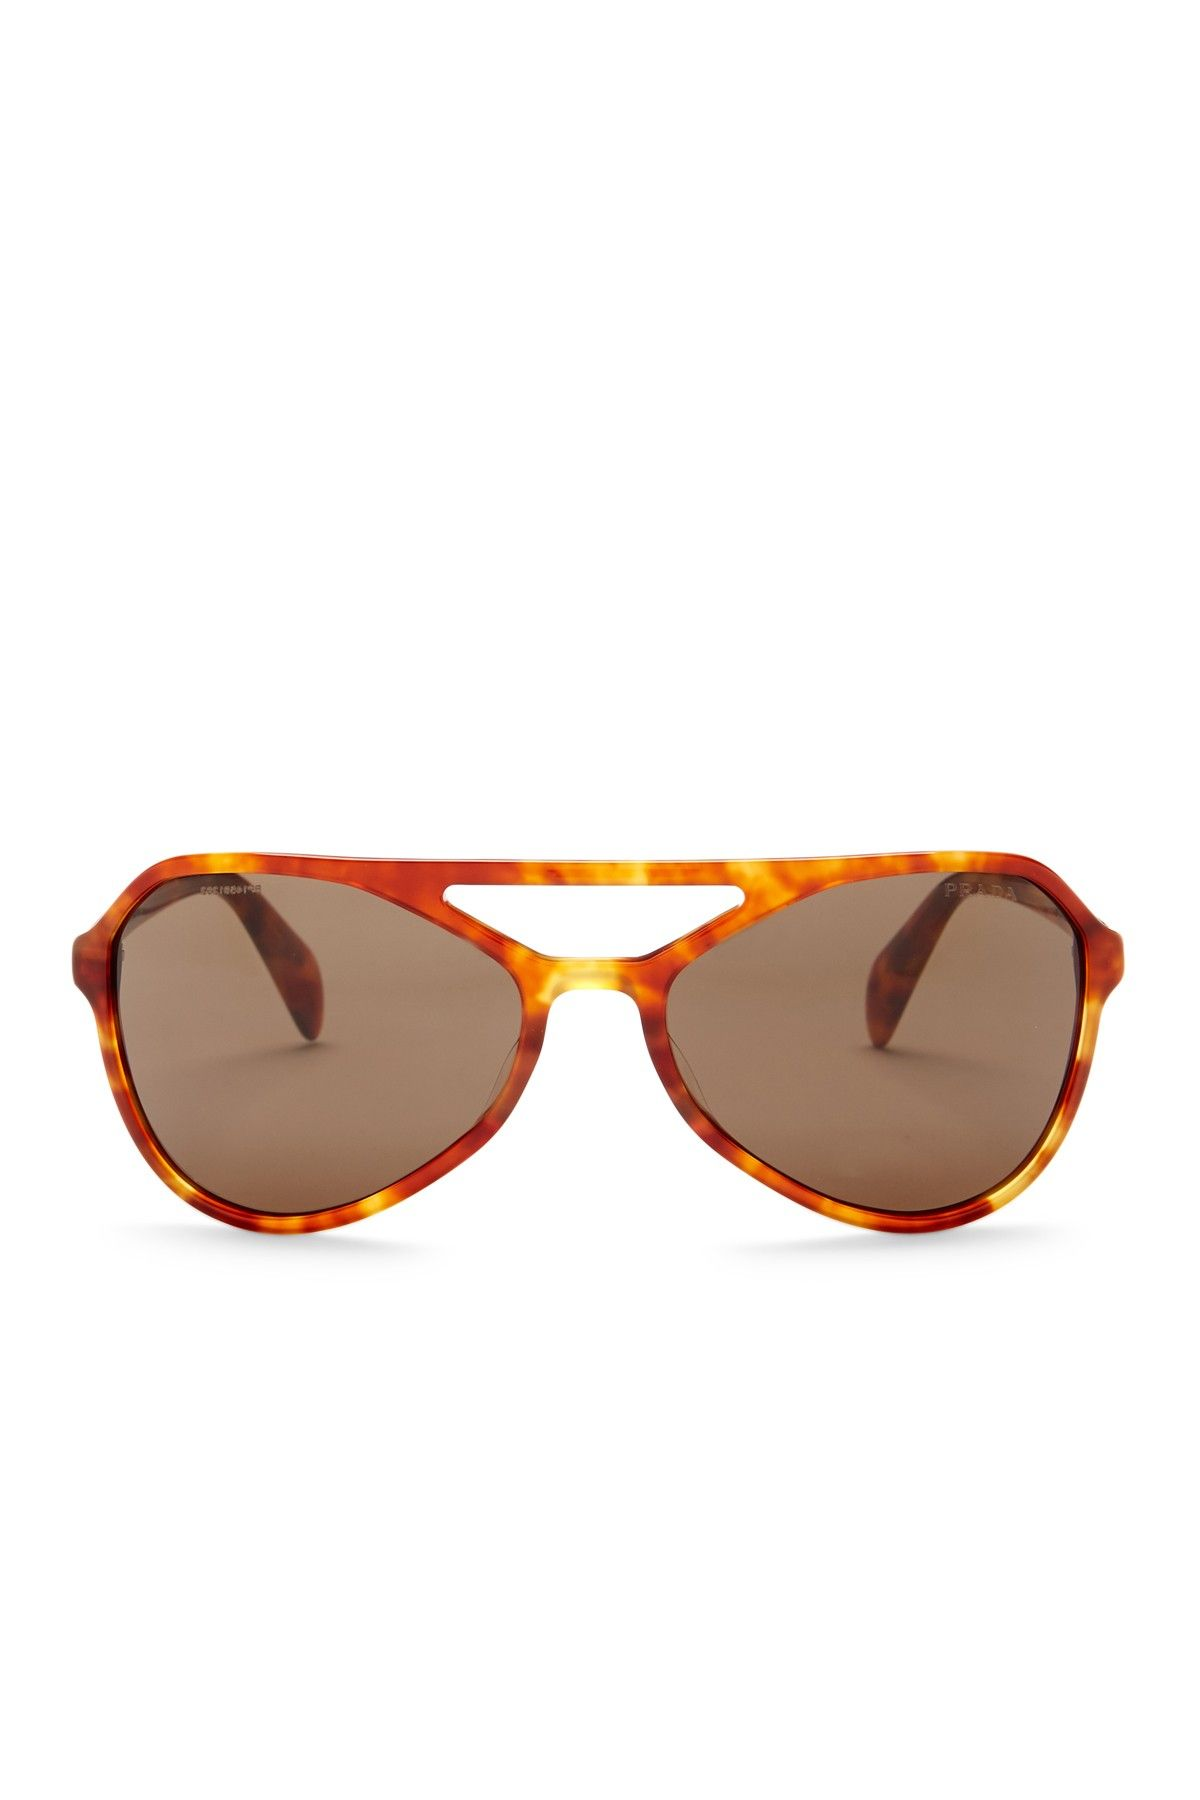 6e76f5bc1e72 Men s Catwalk Aviator Acetate Frame Sunglasses